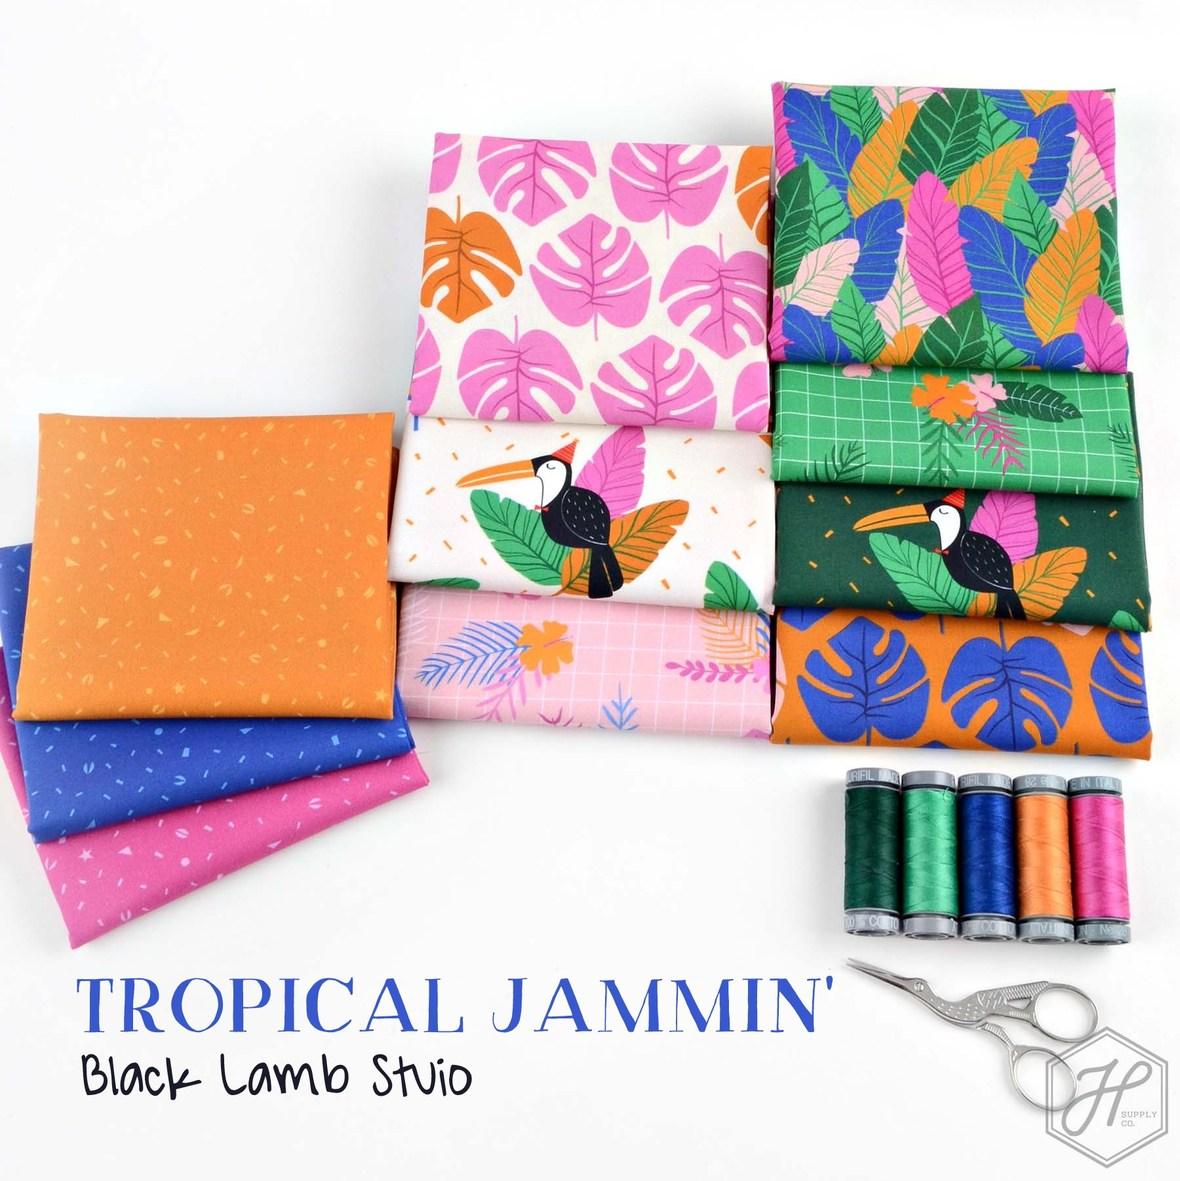 Tropical Jammin Black Lamb Studio Figo Fabric at Hawthorne Supply Co